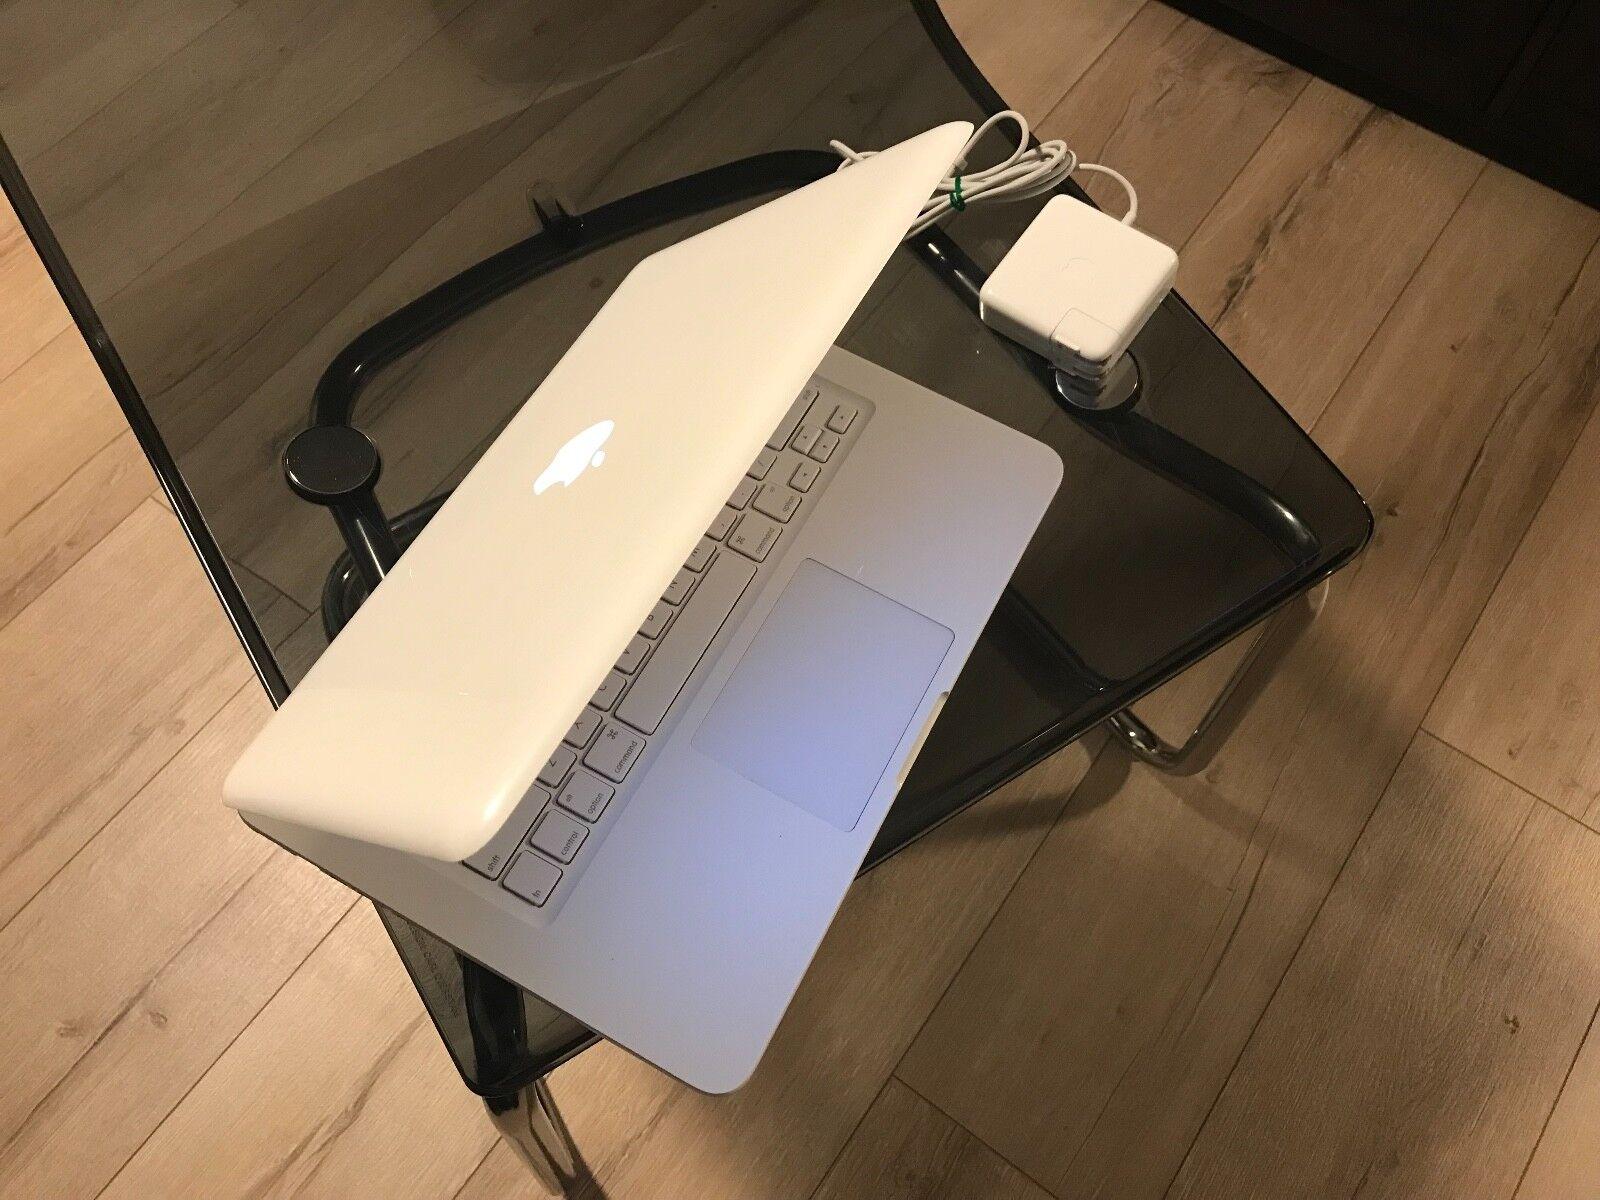 "Apple MacBook White 13"" A1342 250GB HDD, 8GB of Ram. New OS X  High Sierra 2017"